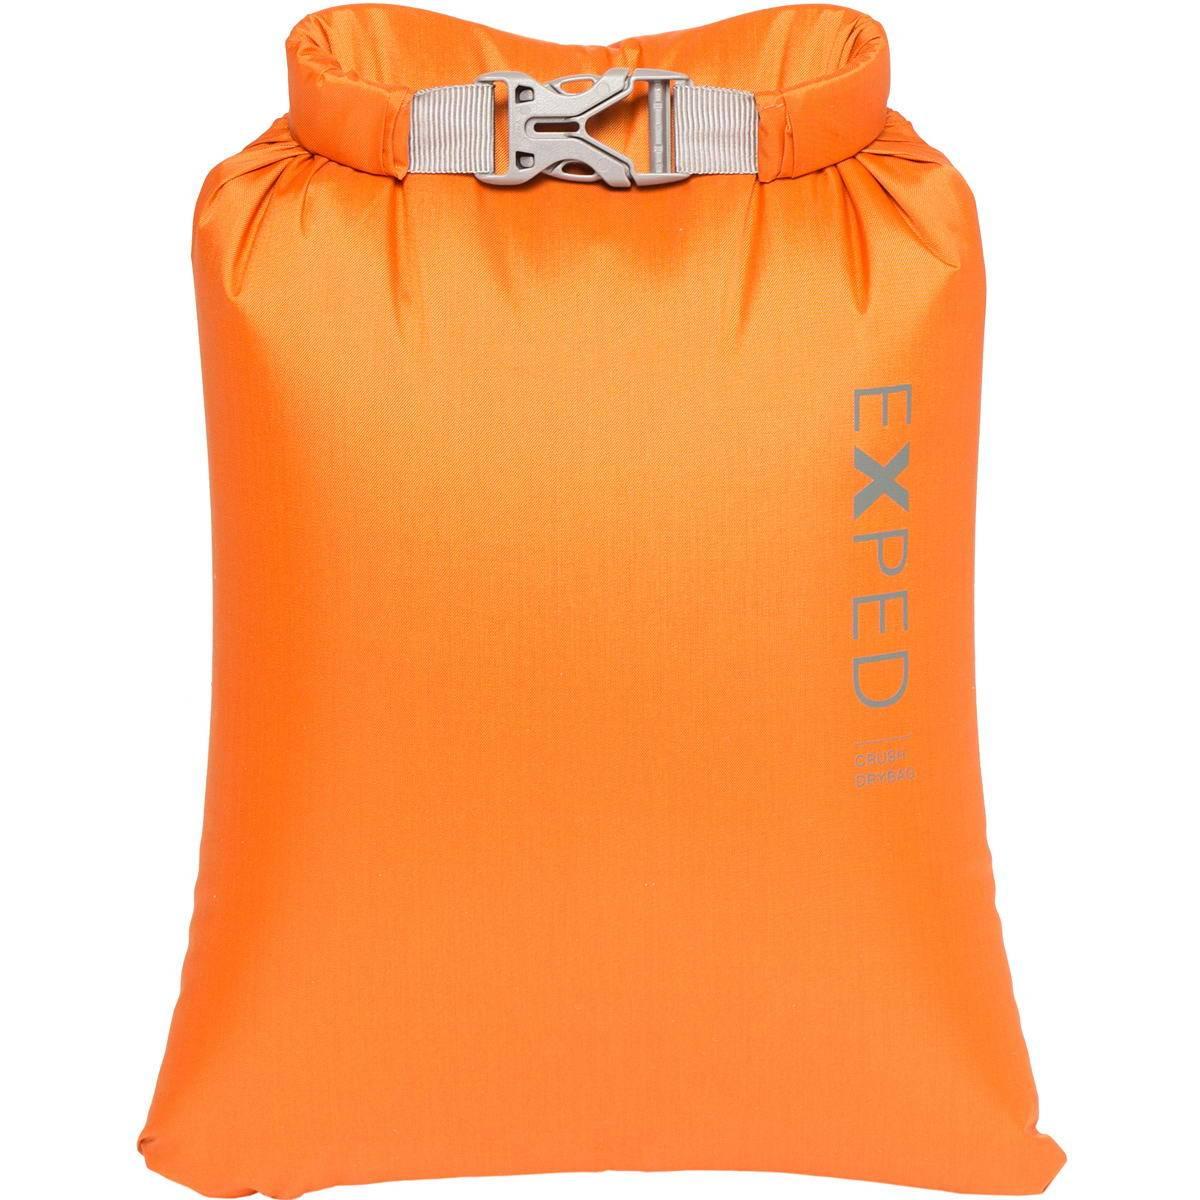 EXPED Crush Drybag XS 2-dimensional - gepolsterter Packsack